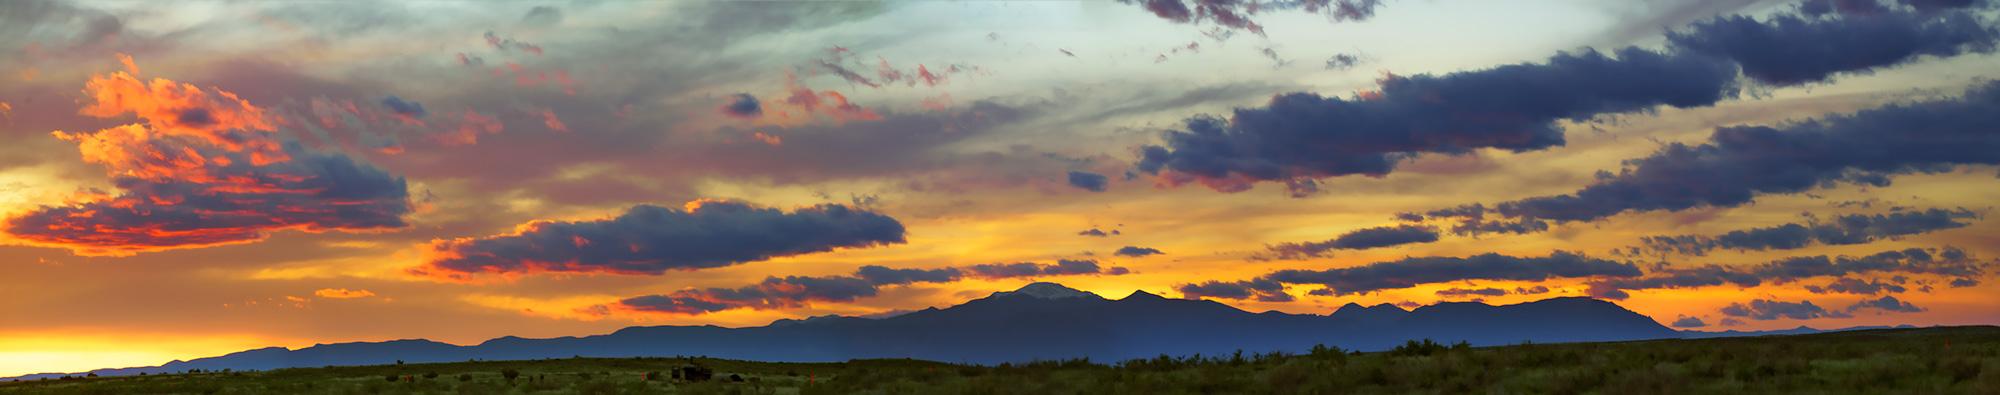 Pikes Peak, sunset, rampart range, Colorado, Pueblo, photo